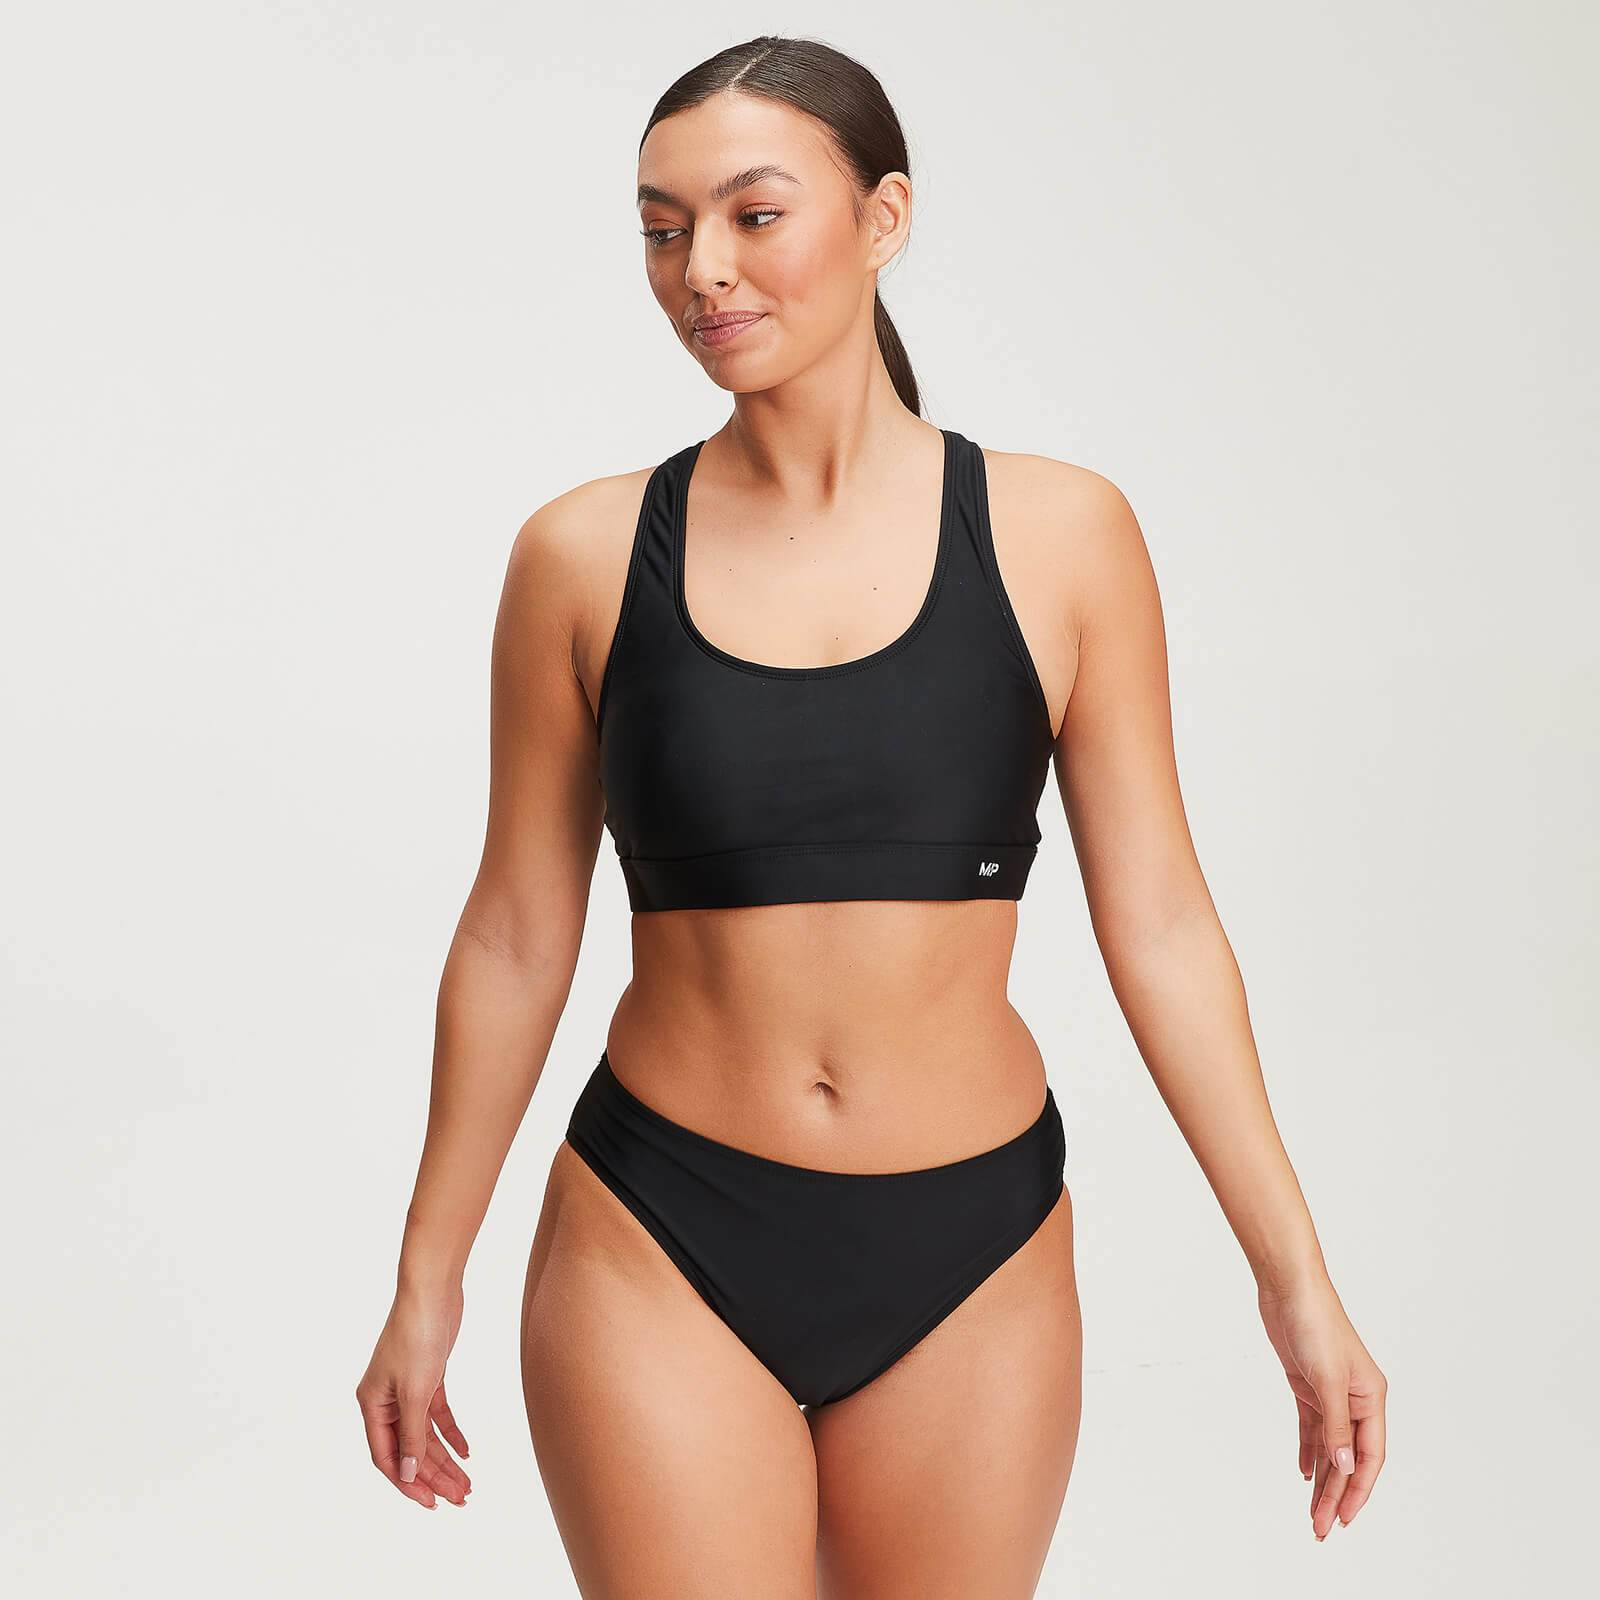 Mp Essentials Bikini Top - Til Kvinder - Sort - Xxl